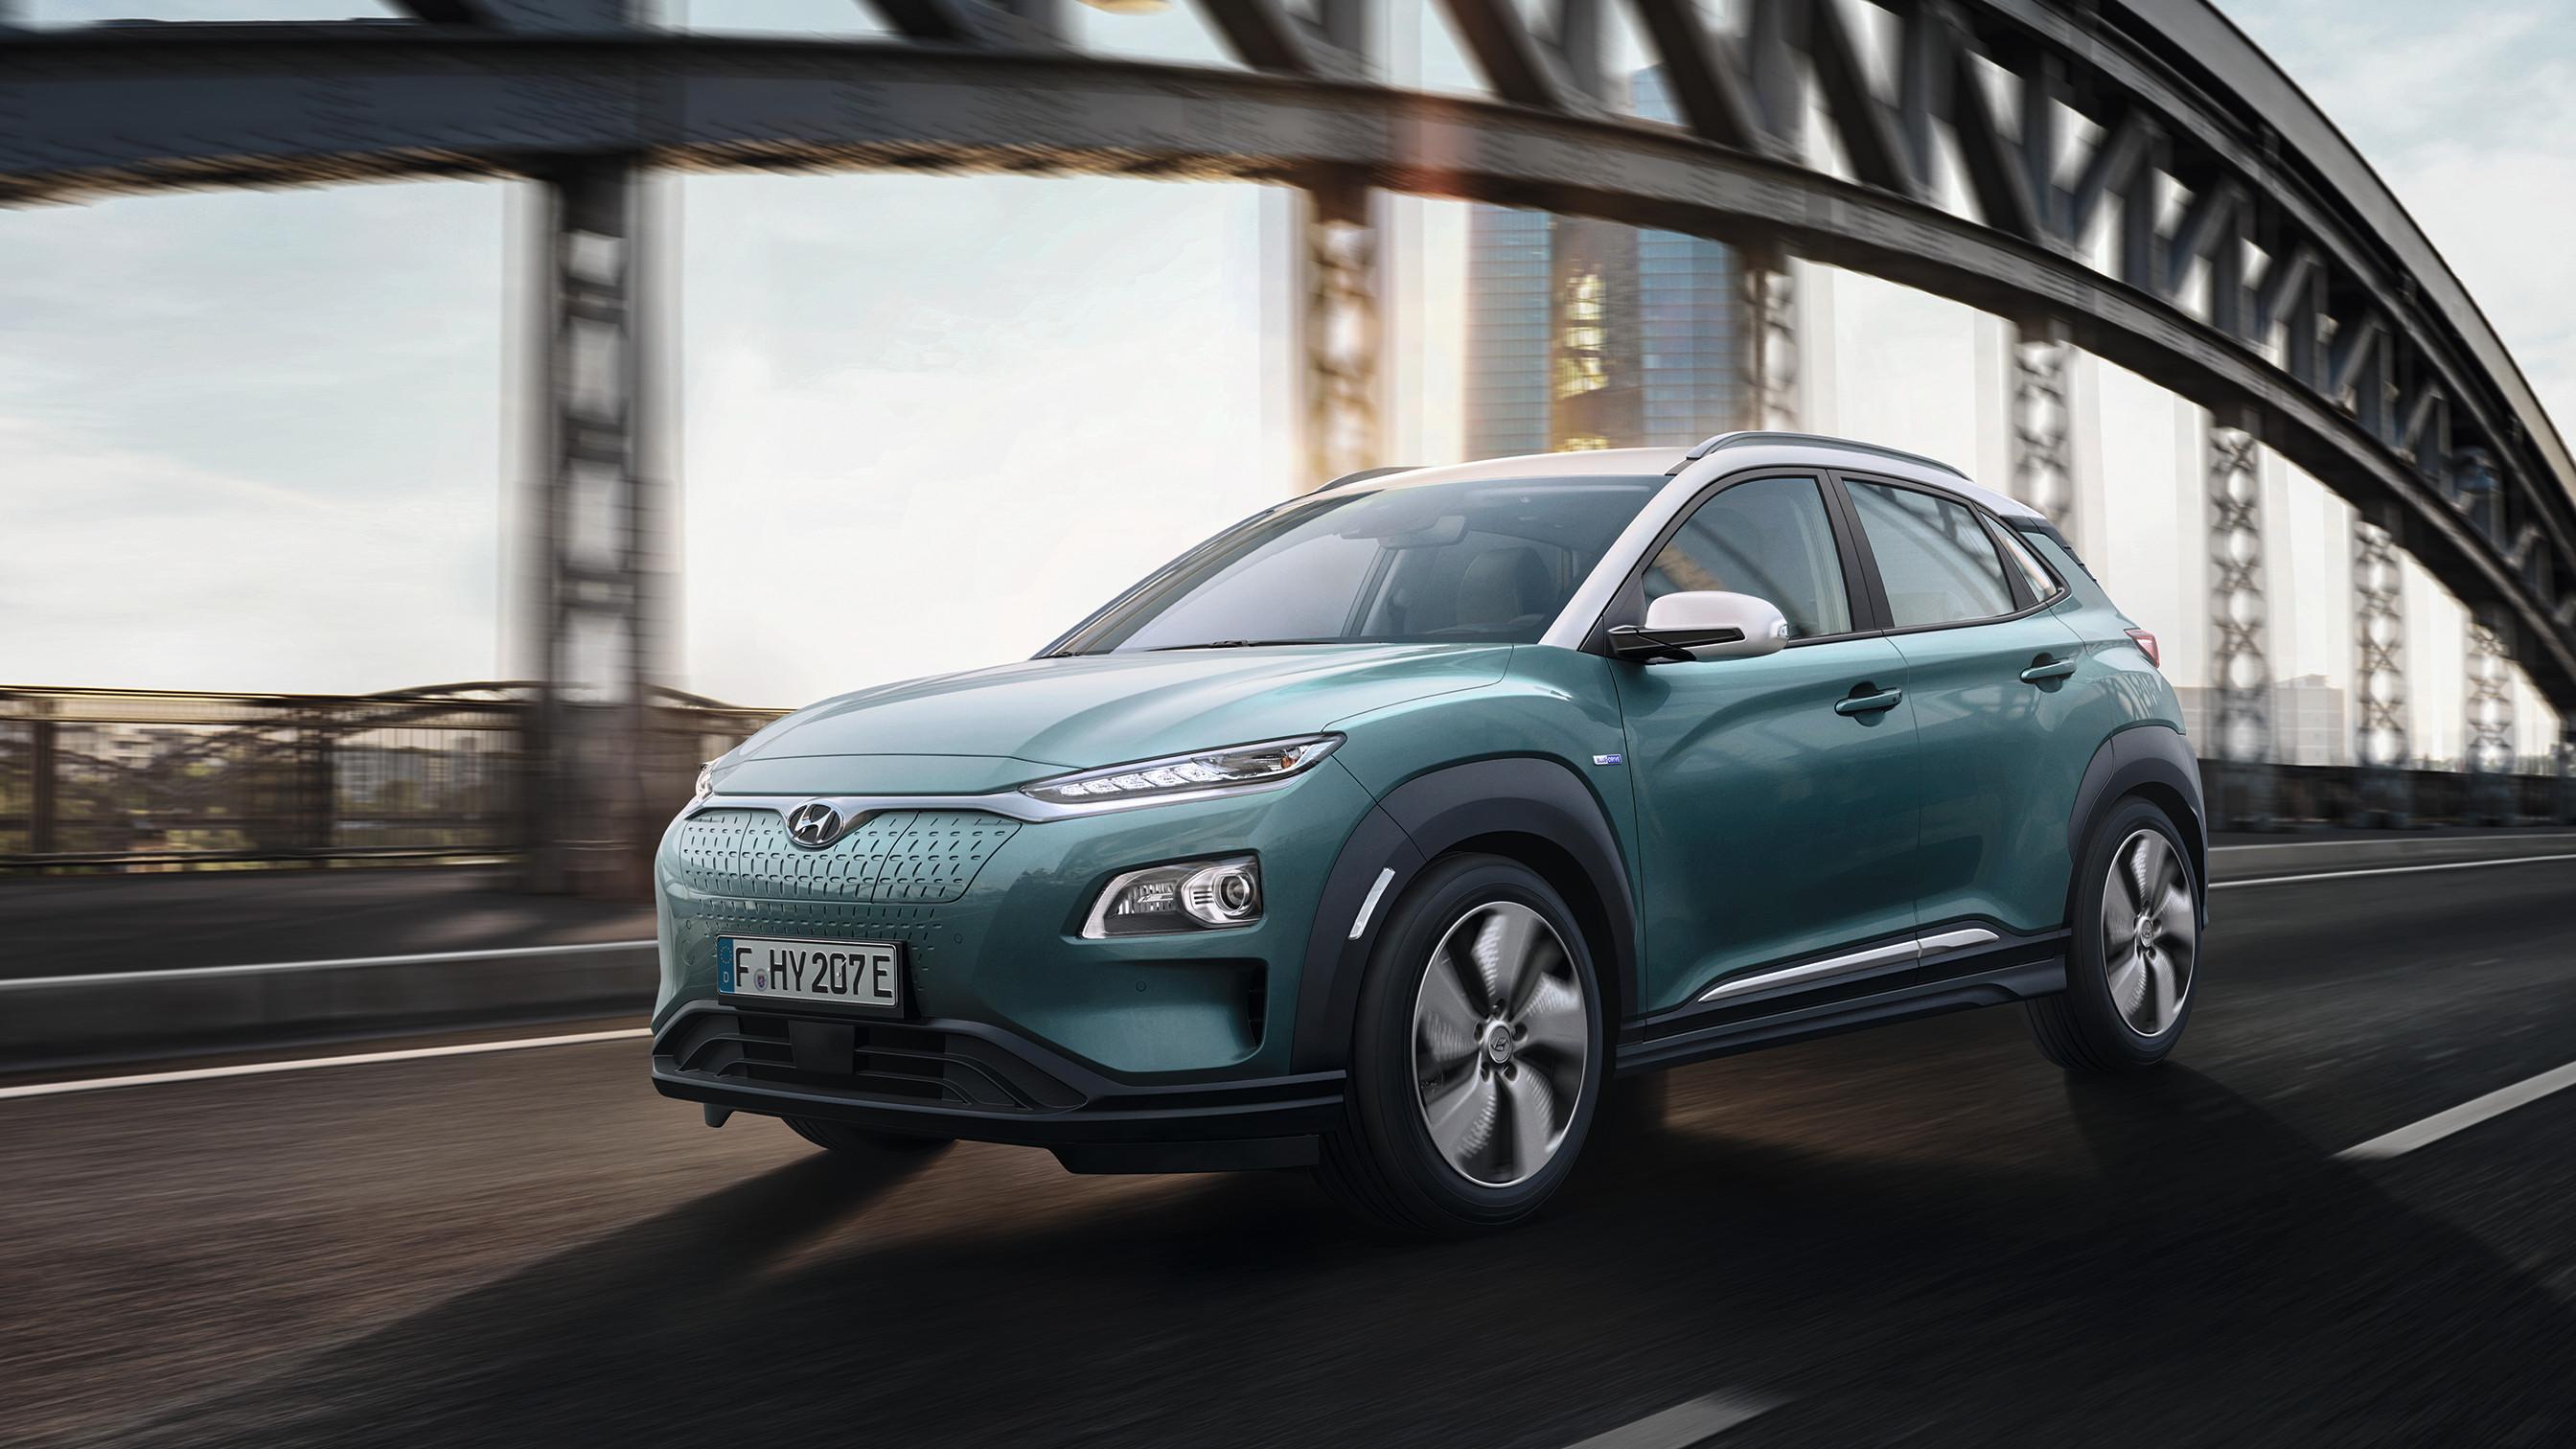 Hyundai Kona Elektro: kompaktes SUV mit bis zu 470 km Reichweite